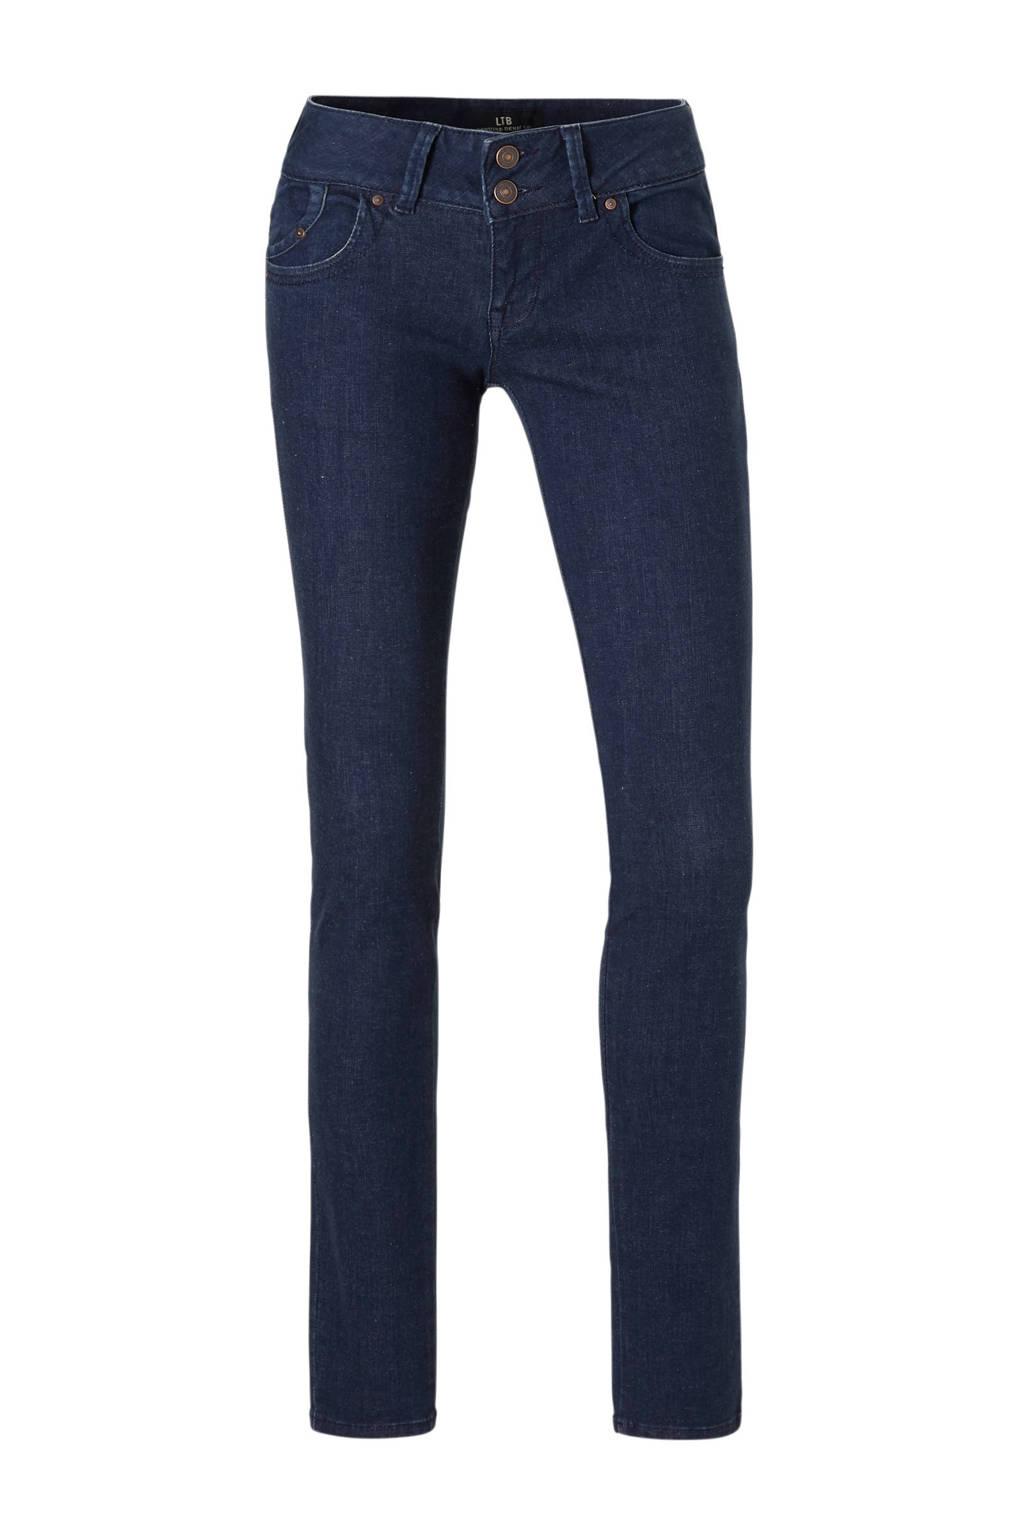 LTB Molly slim fit low waist jeans, Denim